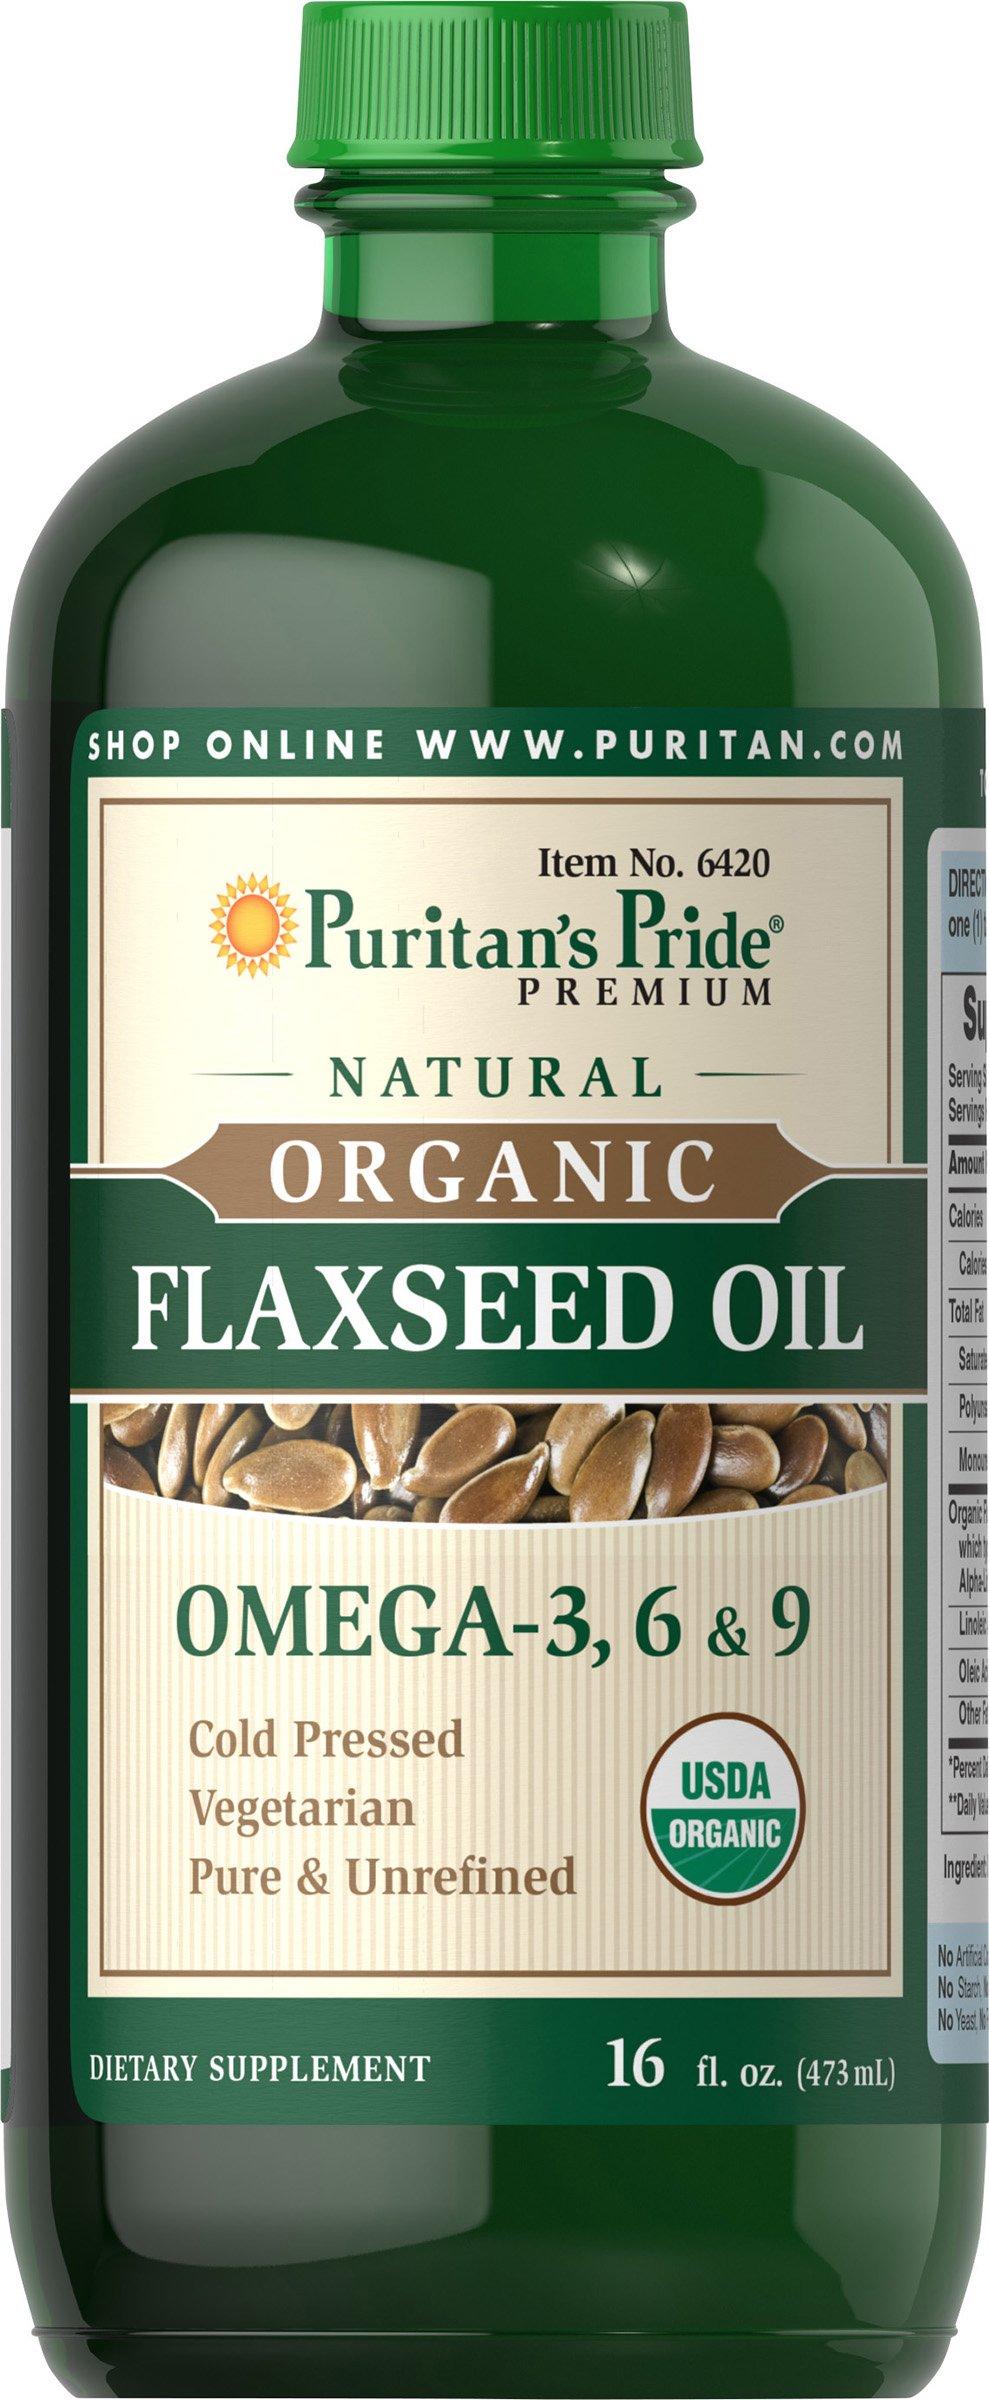 Puritan's Pride Organic Flaxseed Oil-16 fl oz Liquid